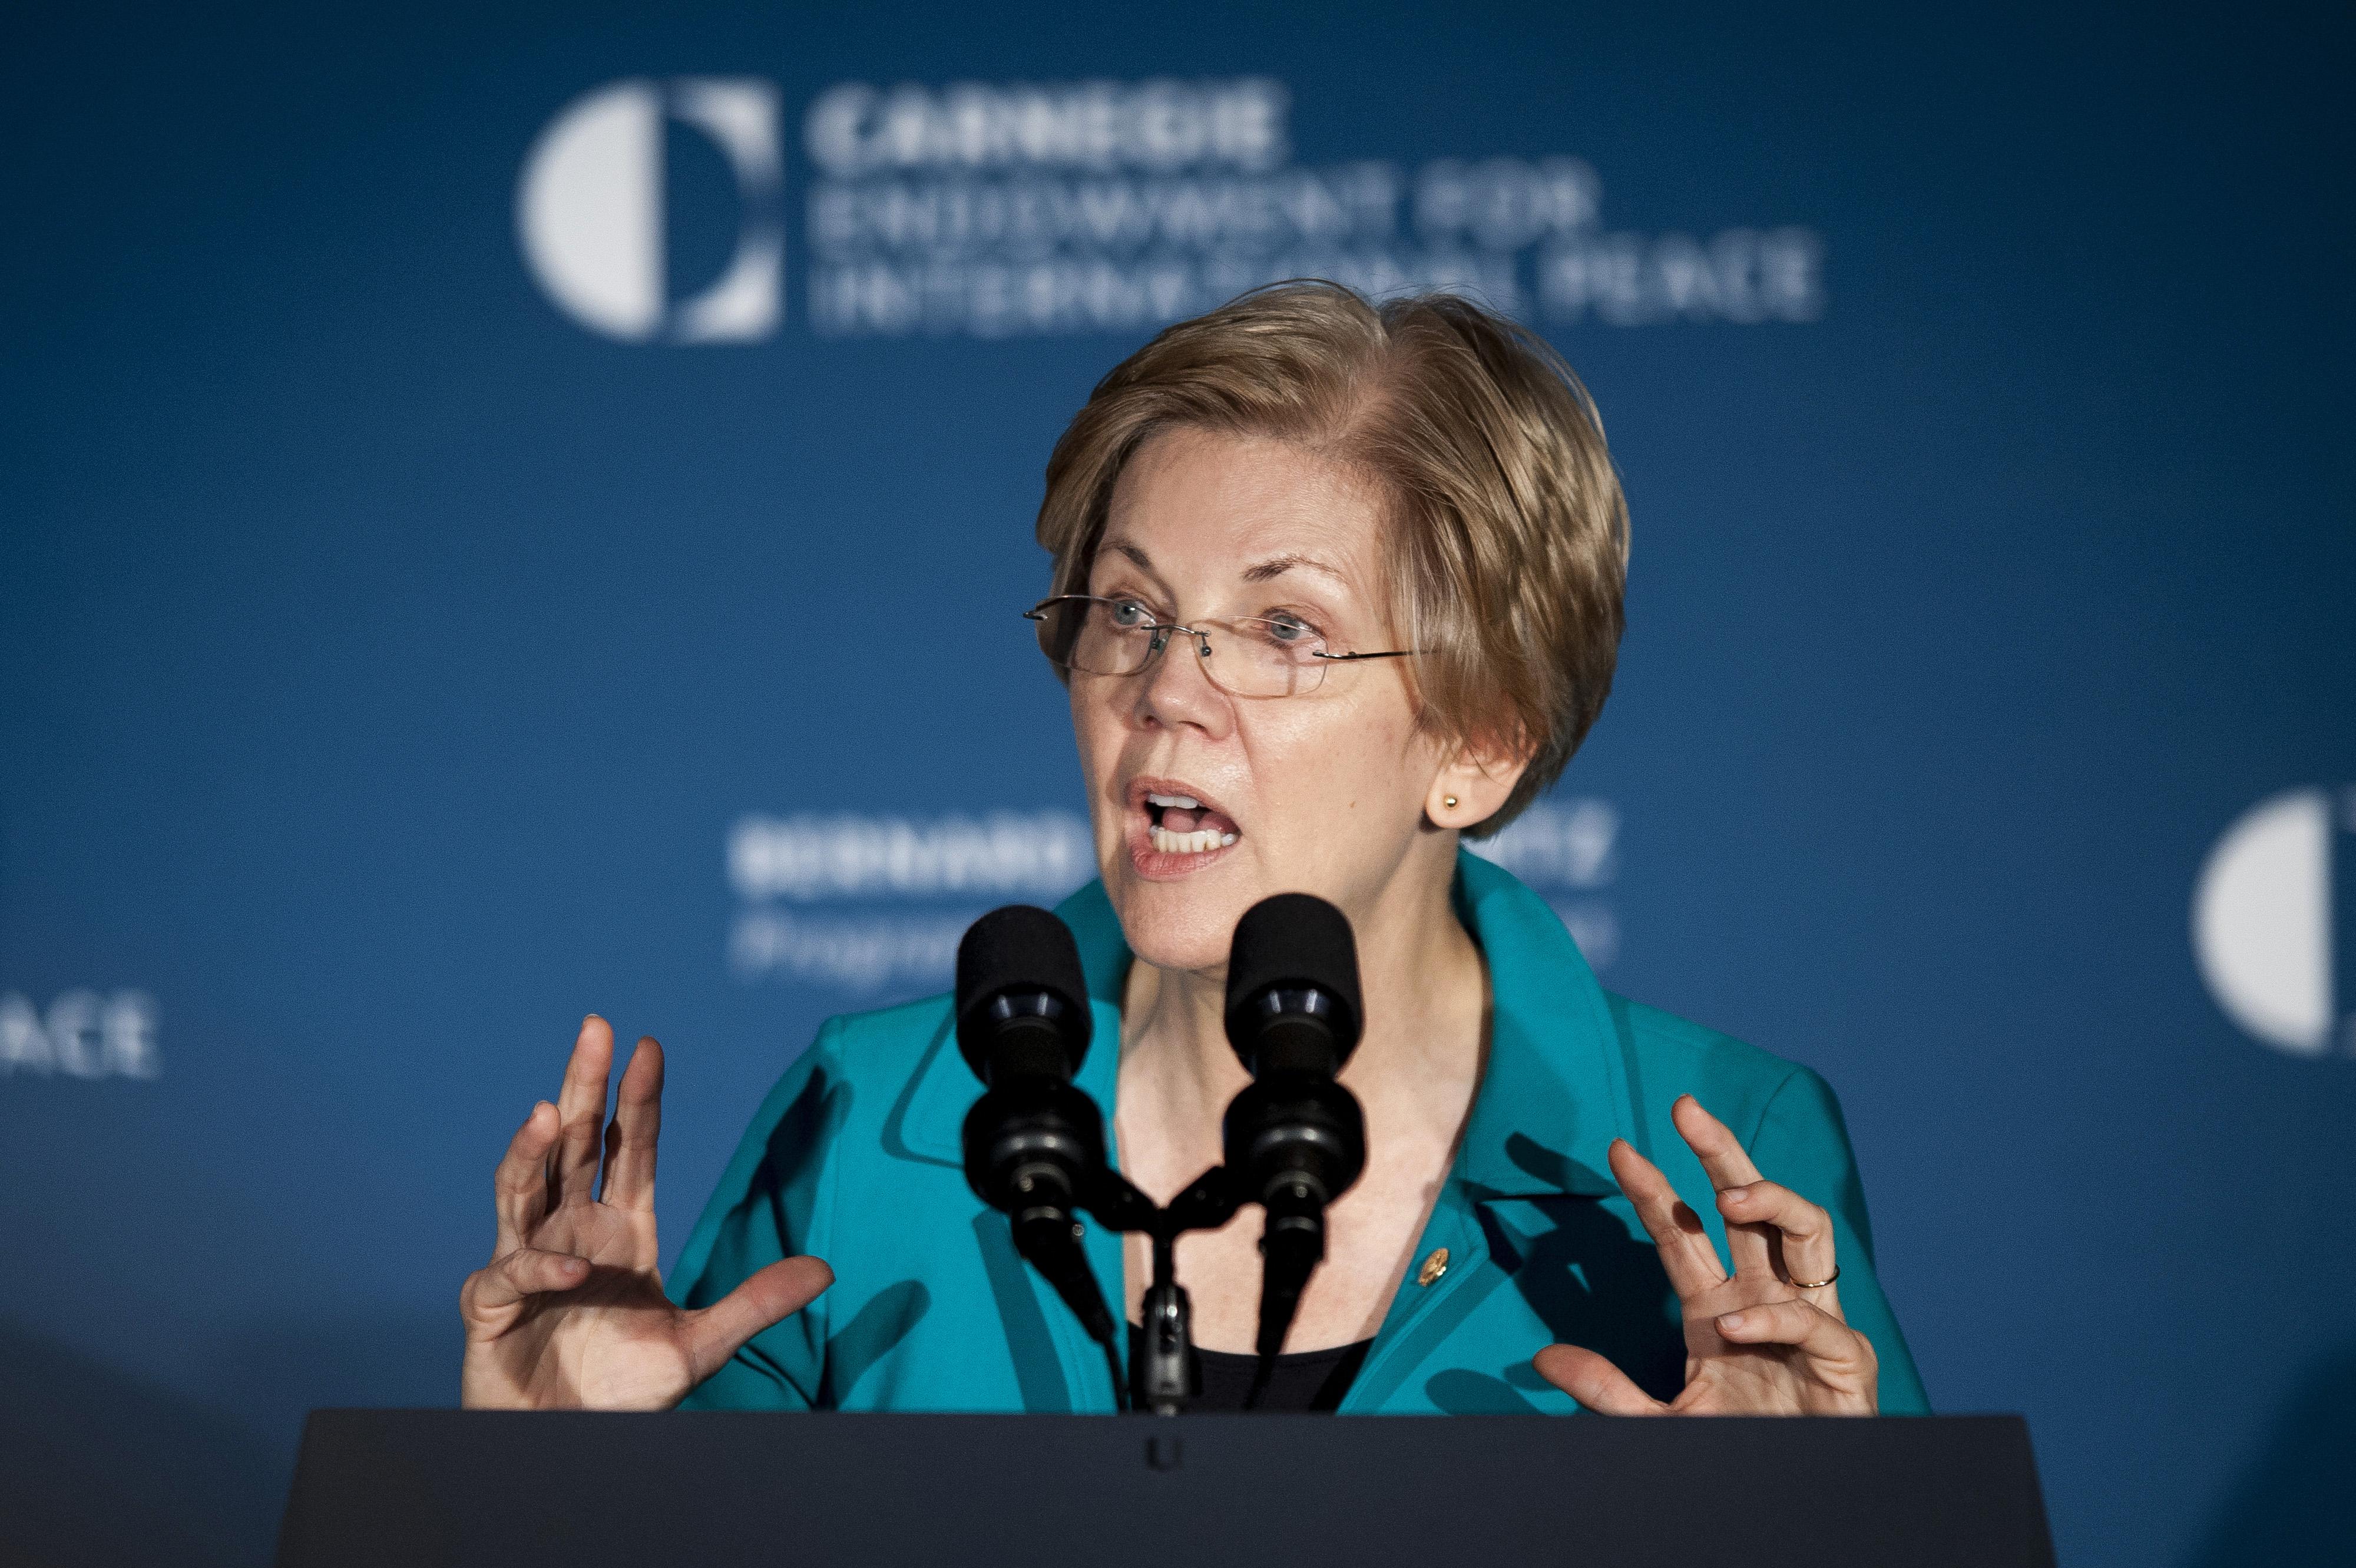 U.S. Vice President Joe Biden And Senator Elizabeth Warren Address The American Job Creation And Infrastructure Forum